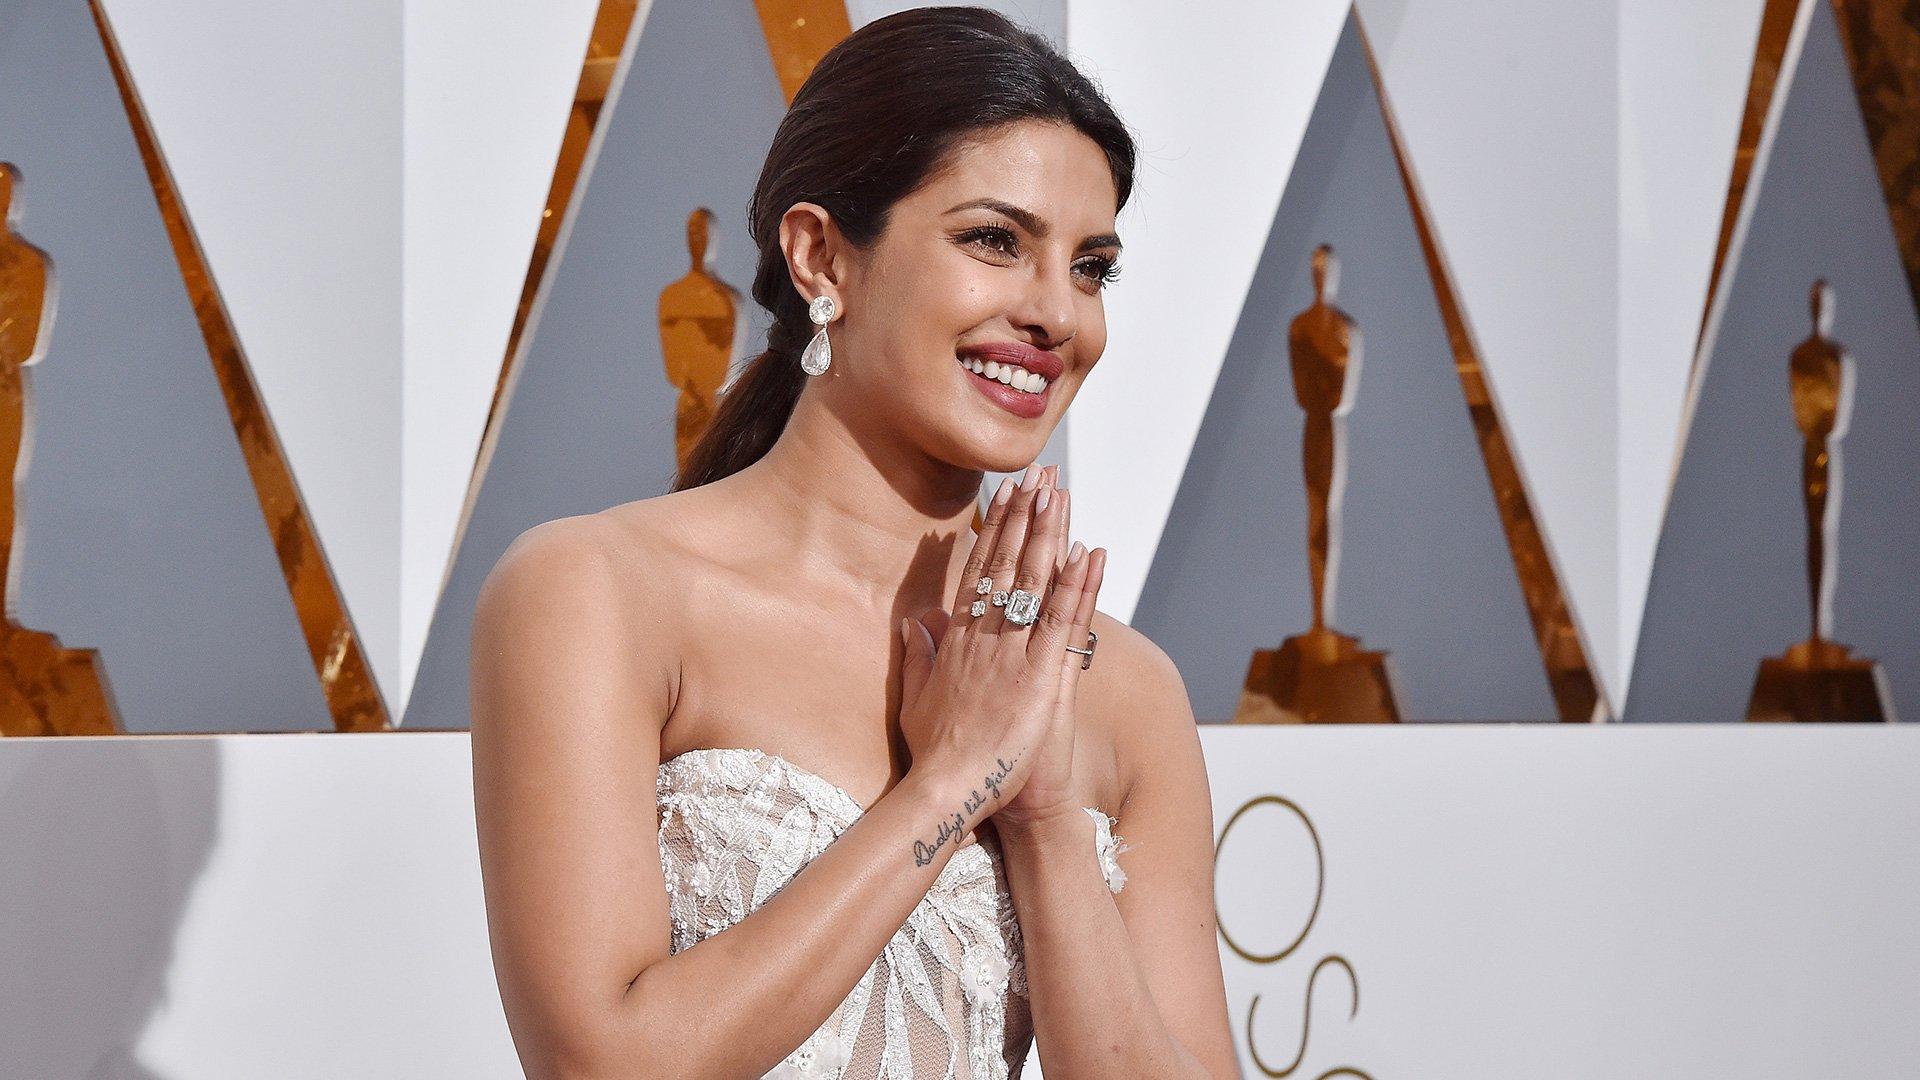 Priyanka Chopra wows on Oscars red carpet in $8 million